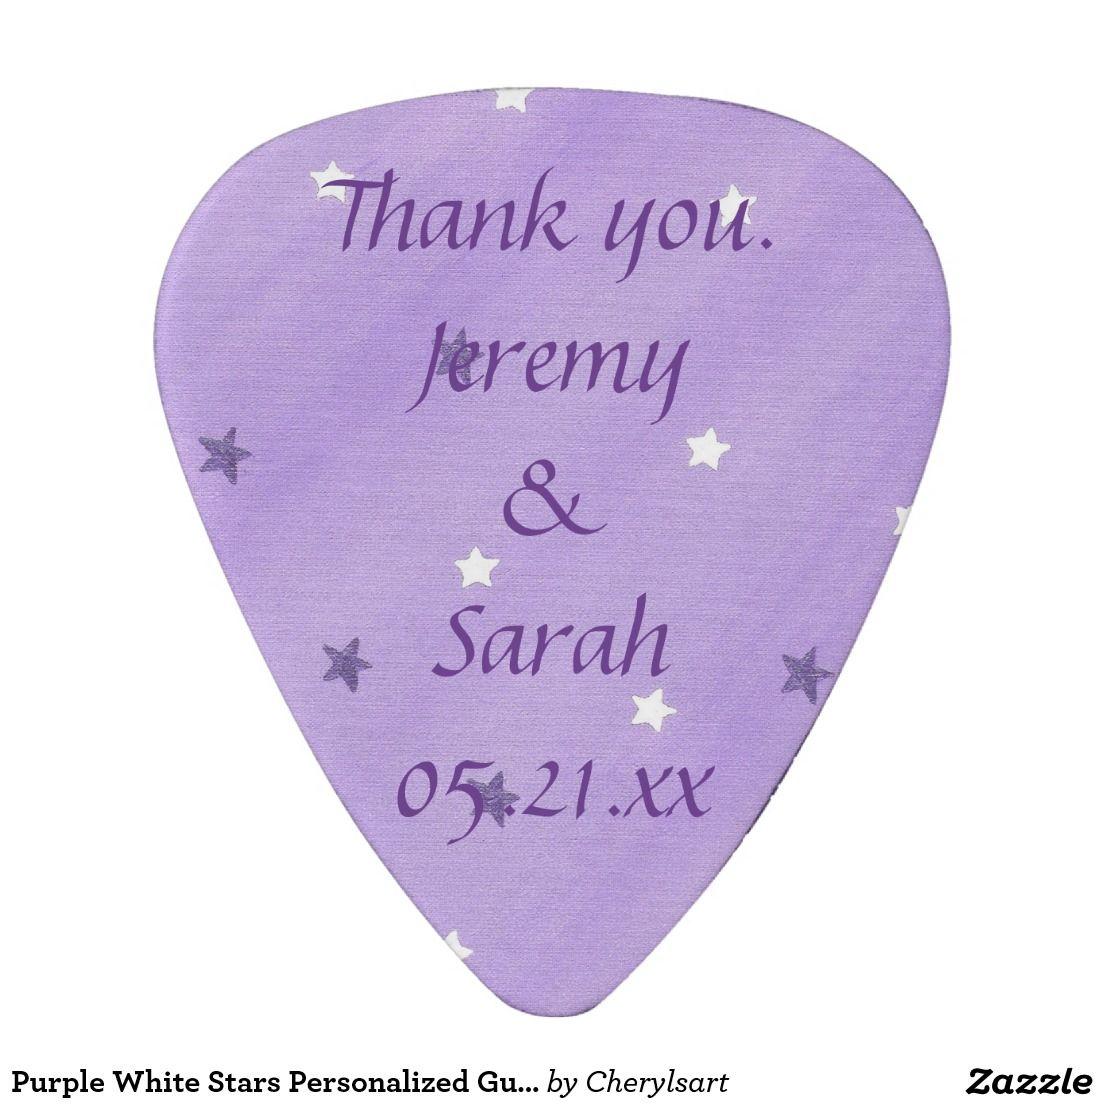 Purple White Stars Personalized Guitar Picks Favor Guitar Pick